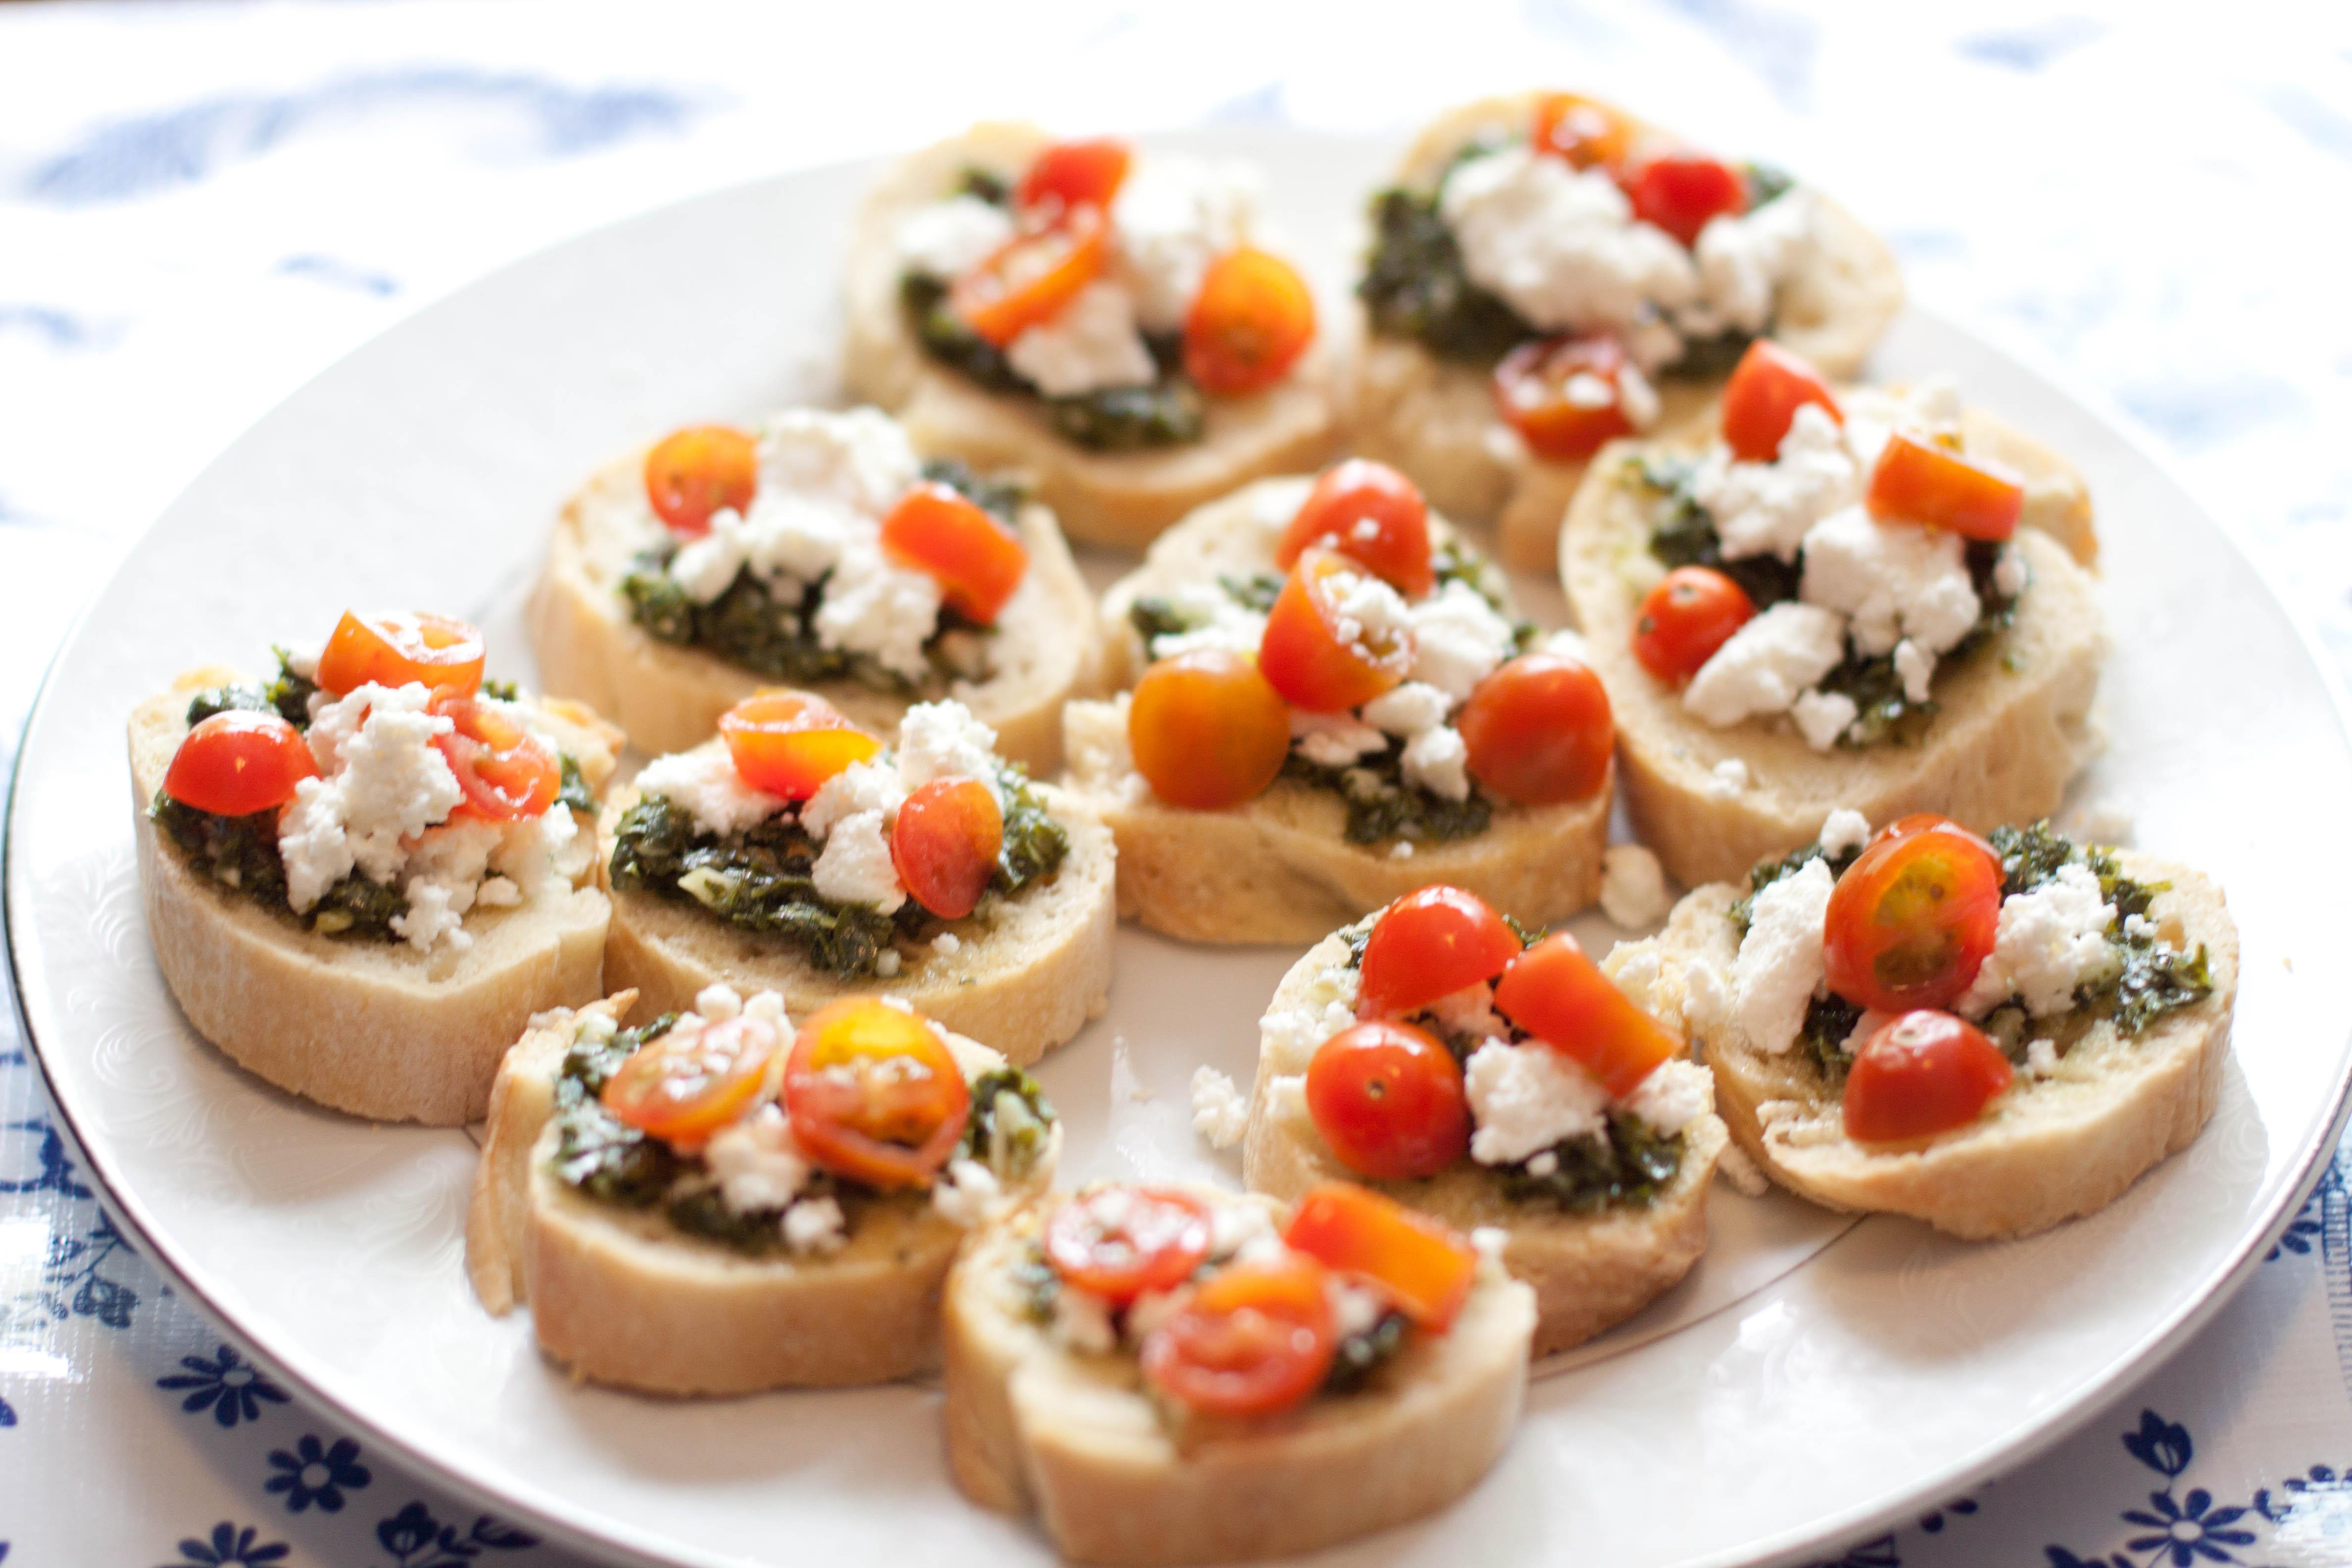 Easy Tomato Bruschetta with Balsamic Glaze | Ahead of Thyme